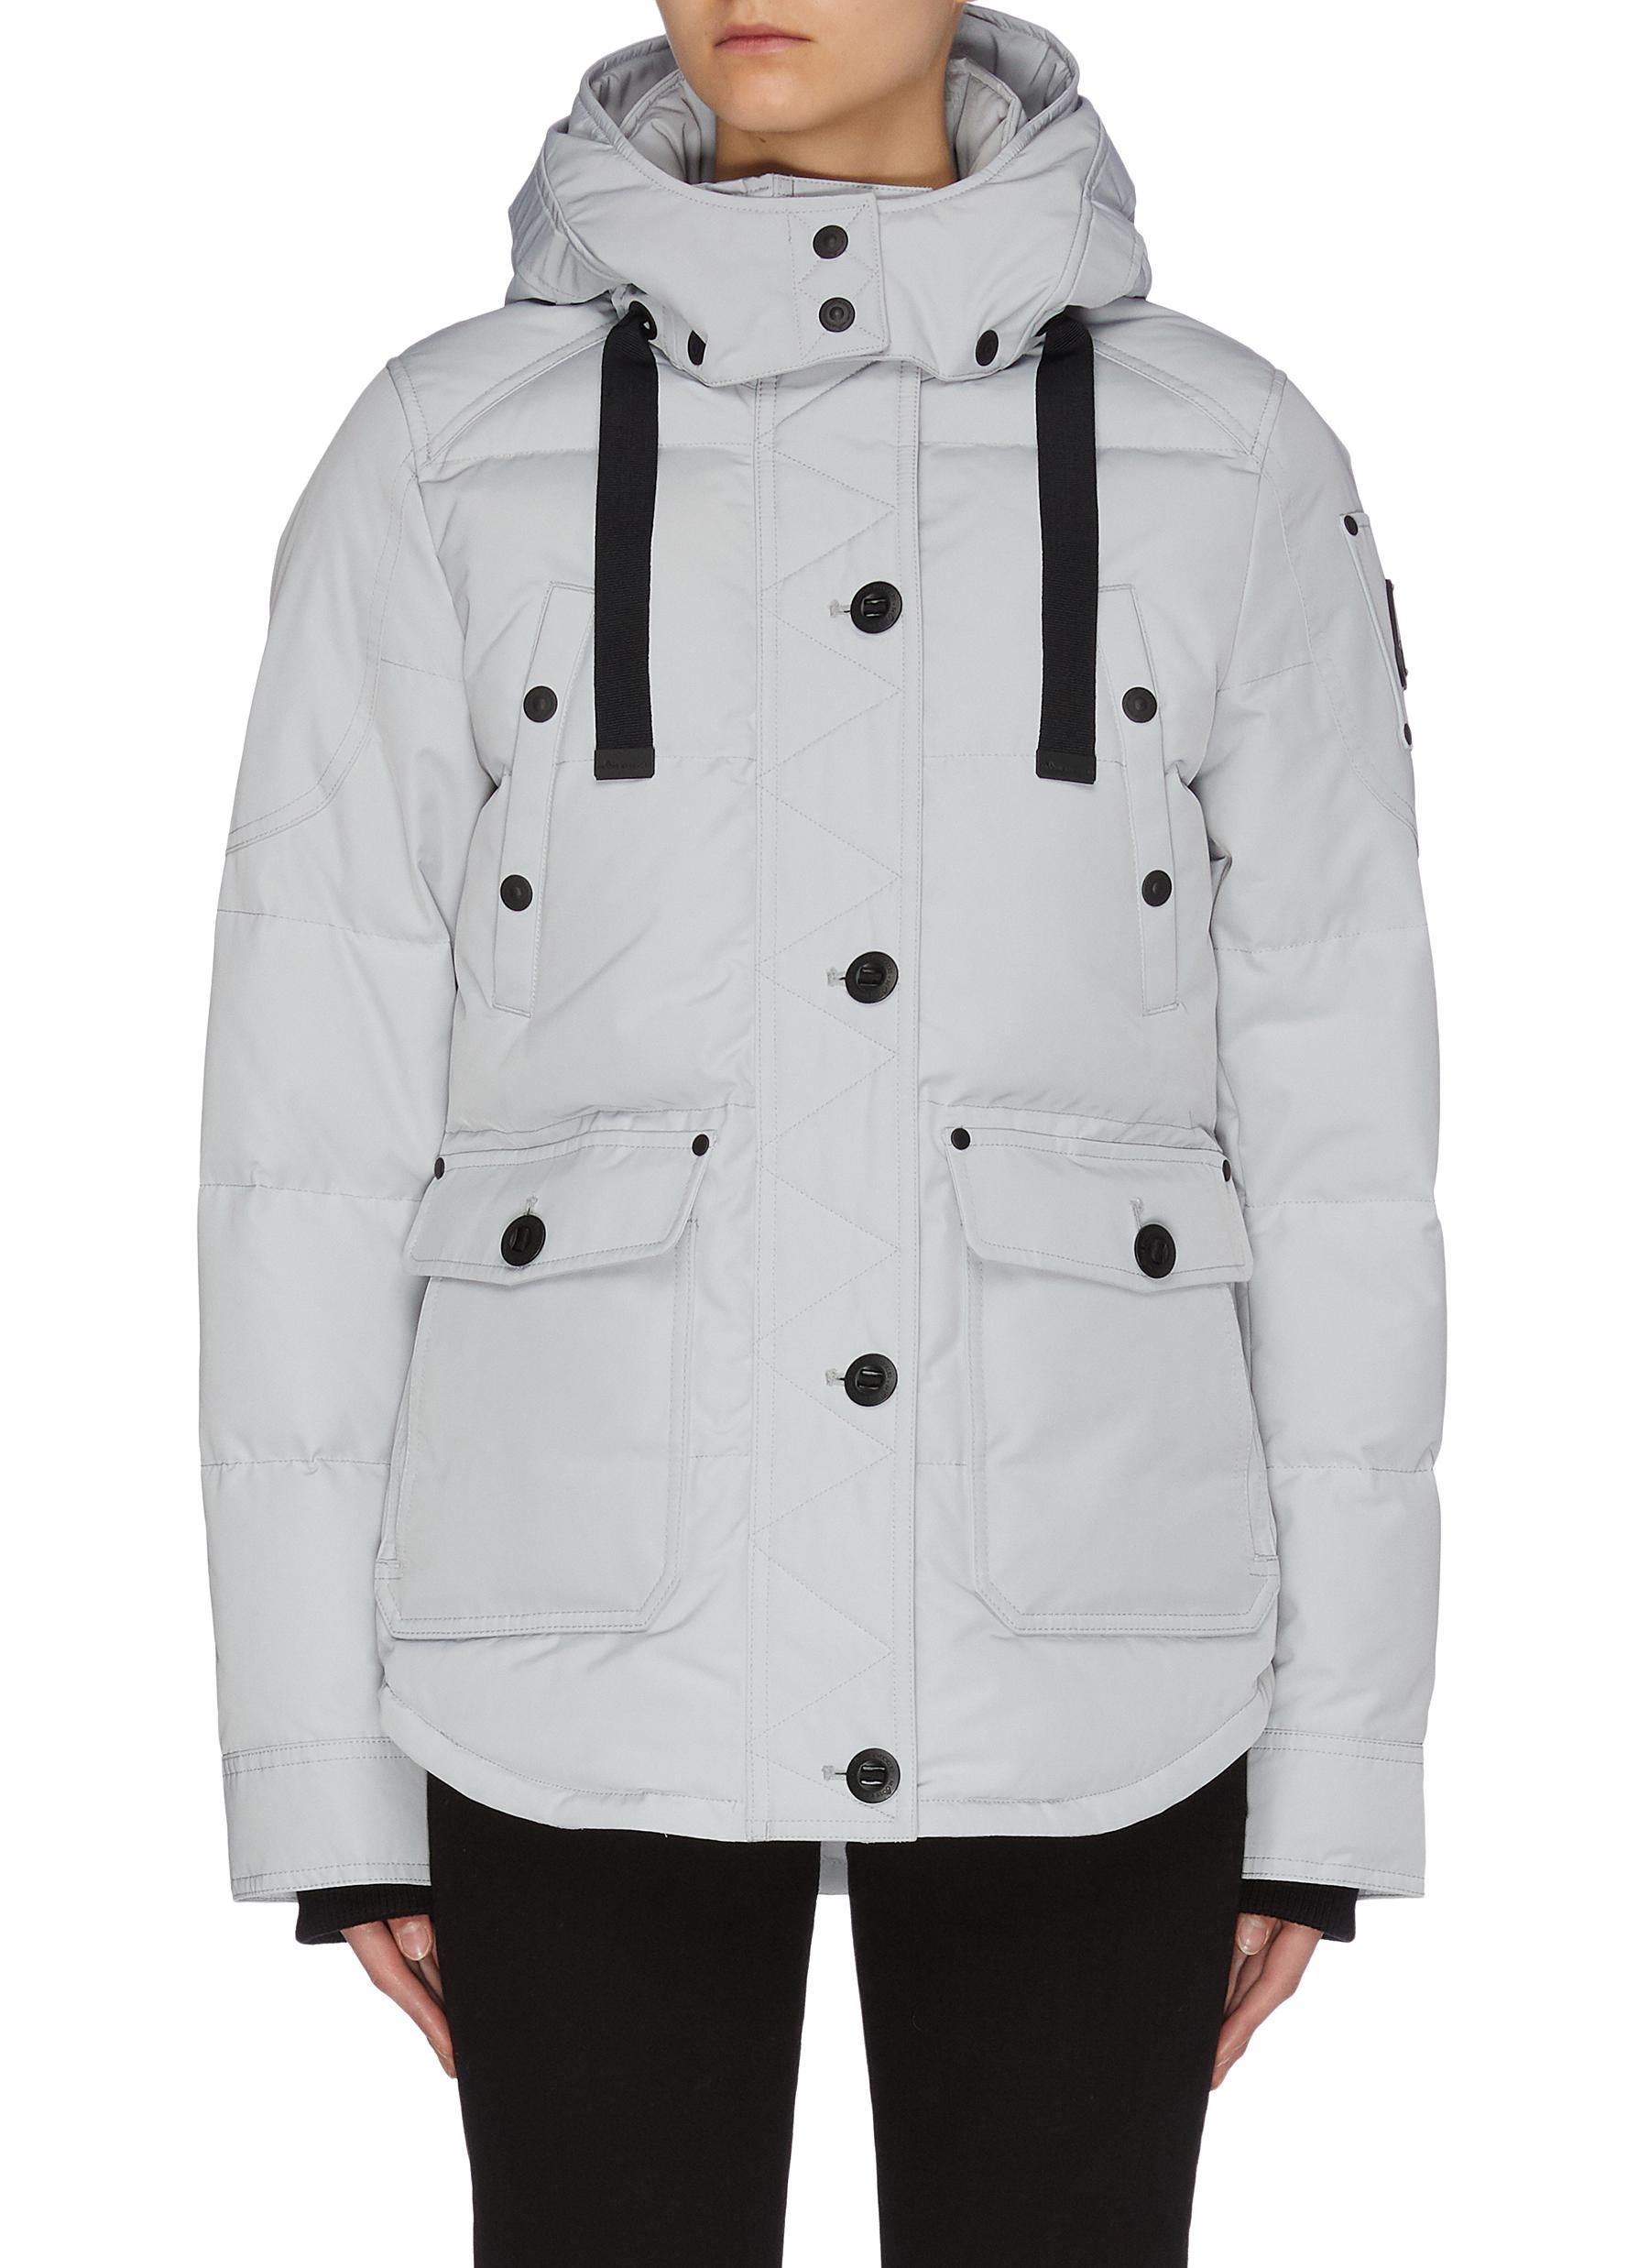 Buy Moose Knuckles Jackets 'Godbout' detachable hood down jacket